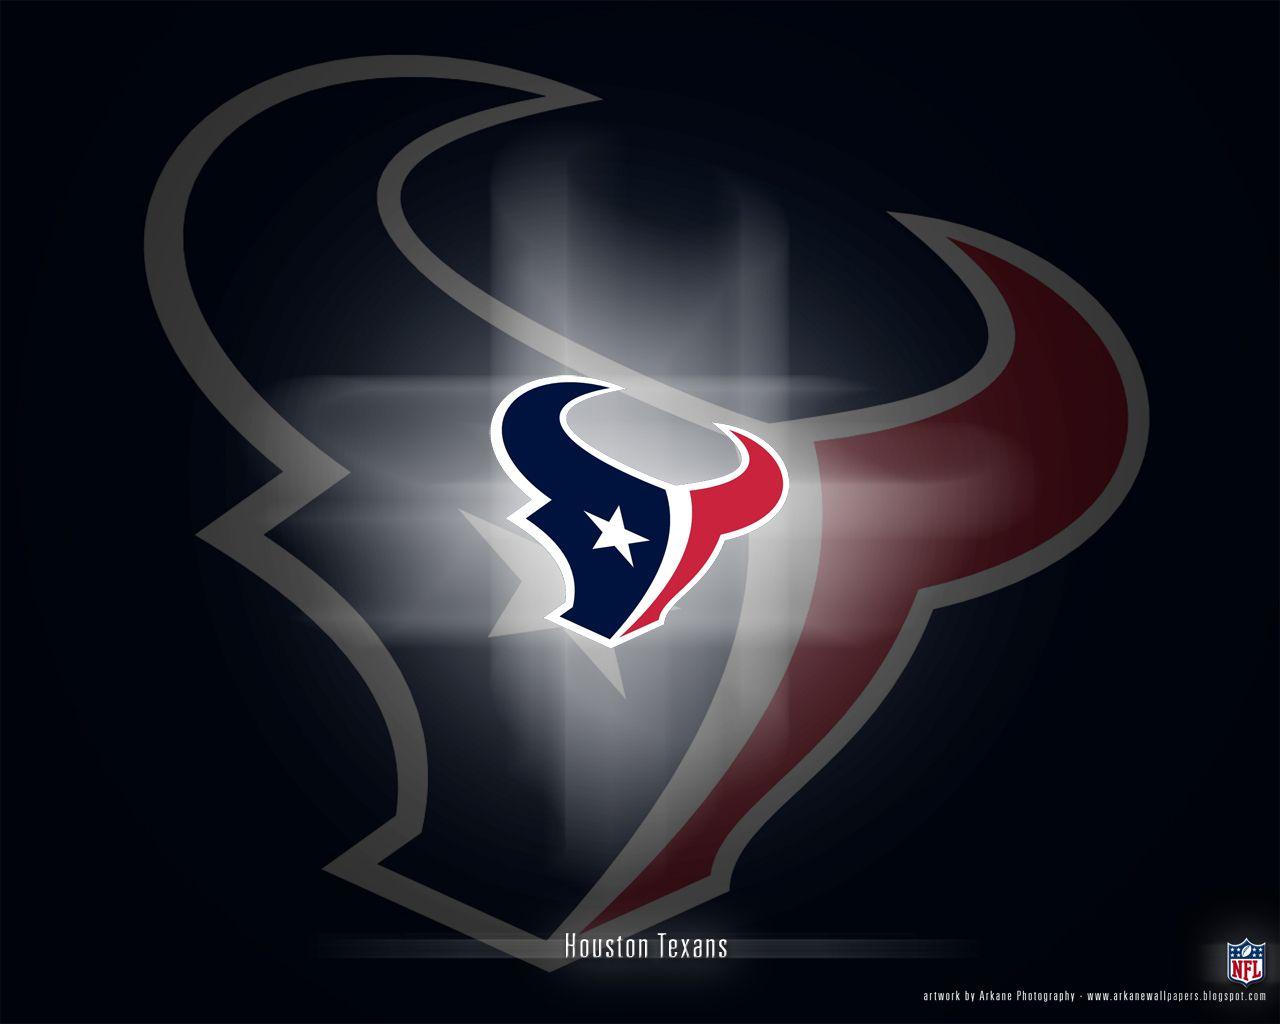 Houston+Texans+2013.